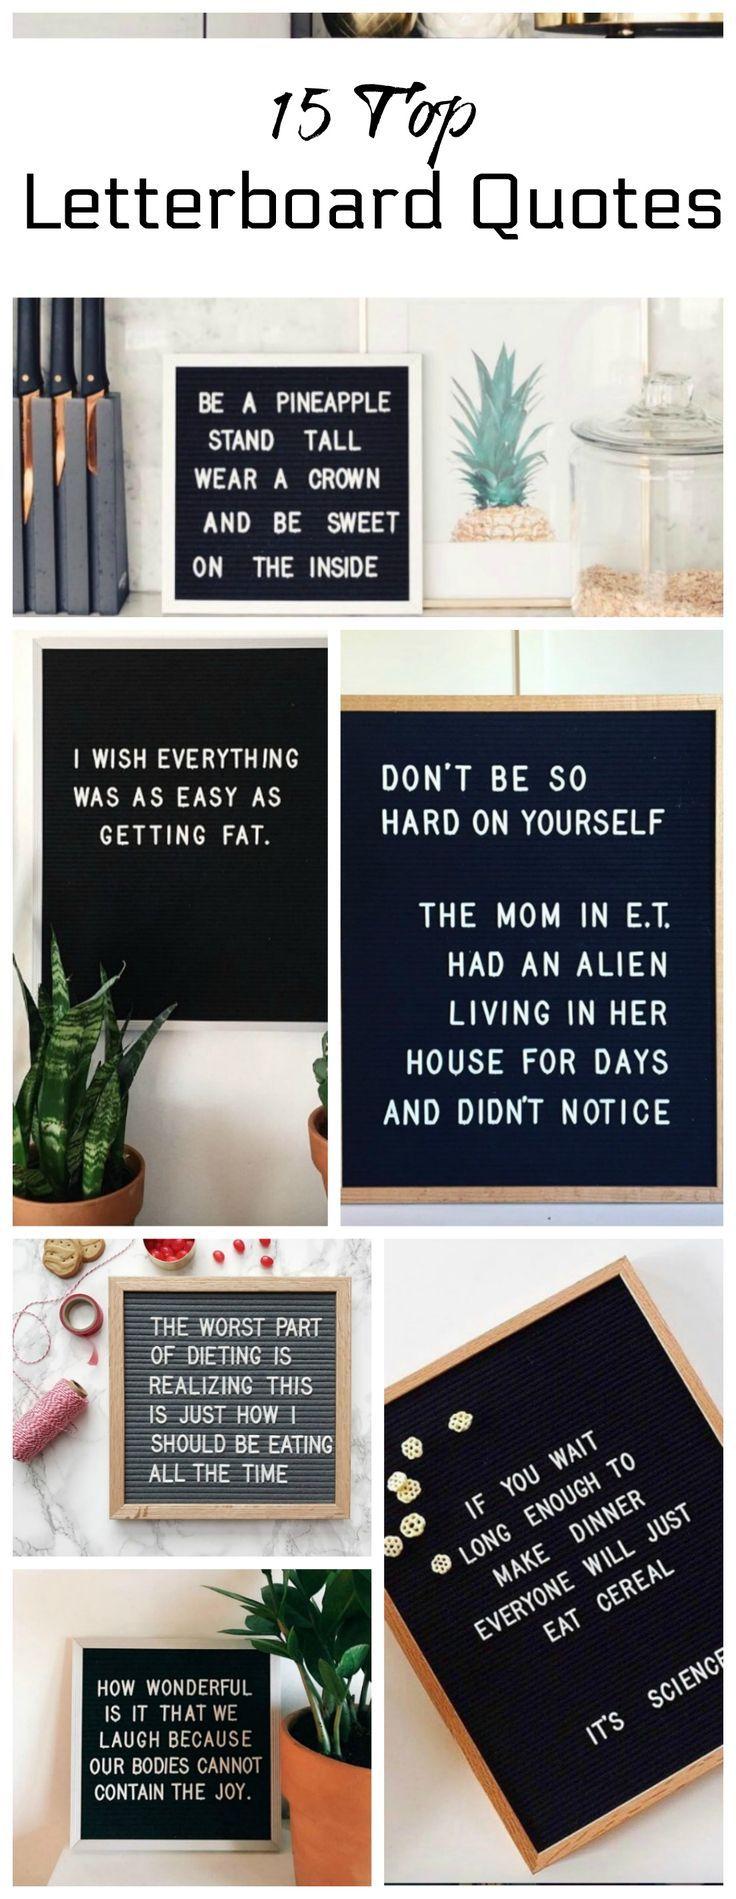 Letterbord